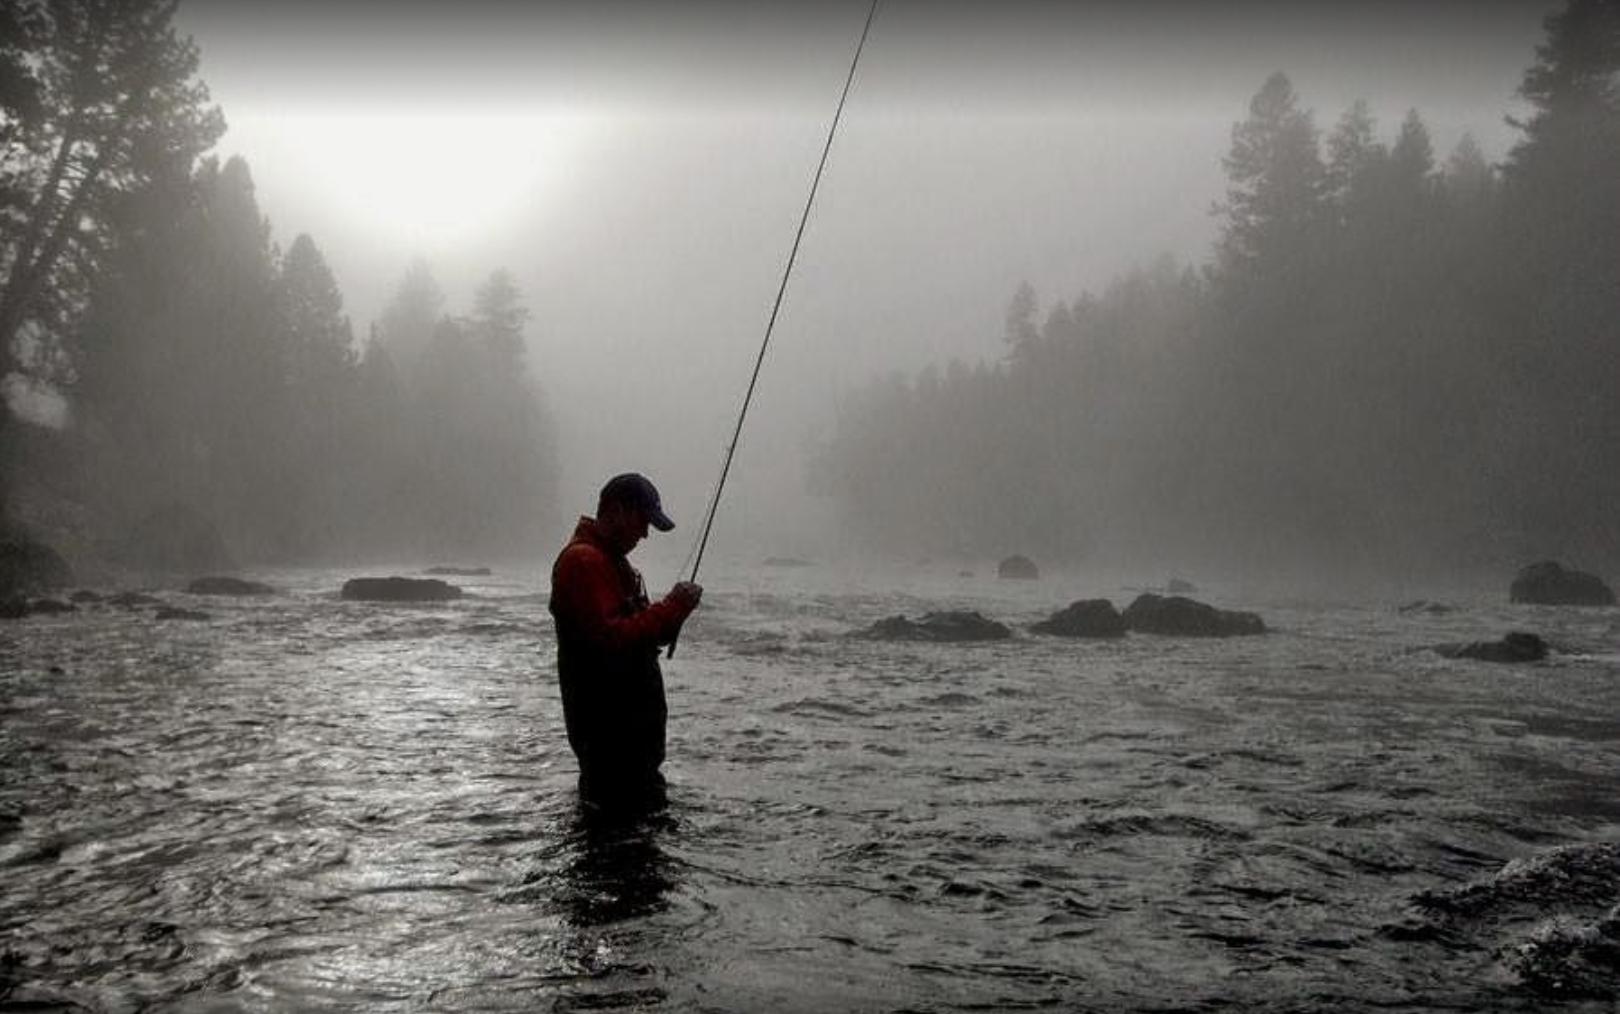 Kayaking, Stand Up Paddle Boarding, Fly Fishing, Tubing   806 Washington Ave  Golden, CO 80401   Fly Fishing